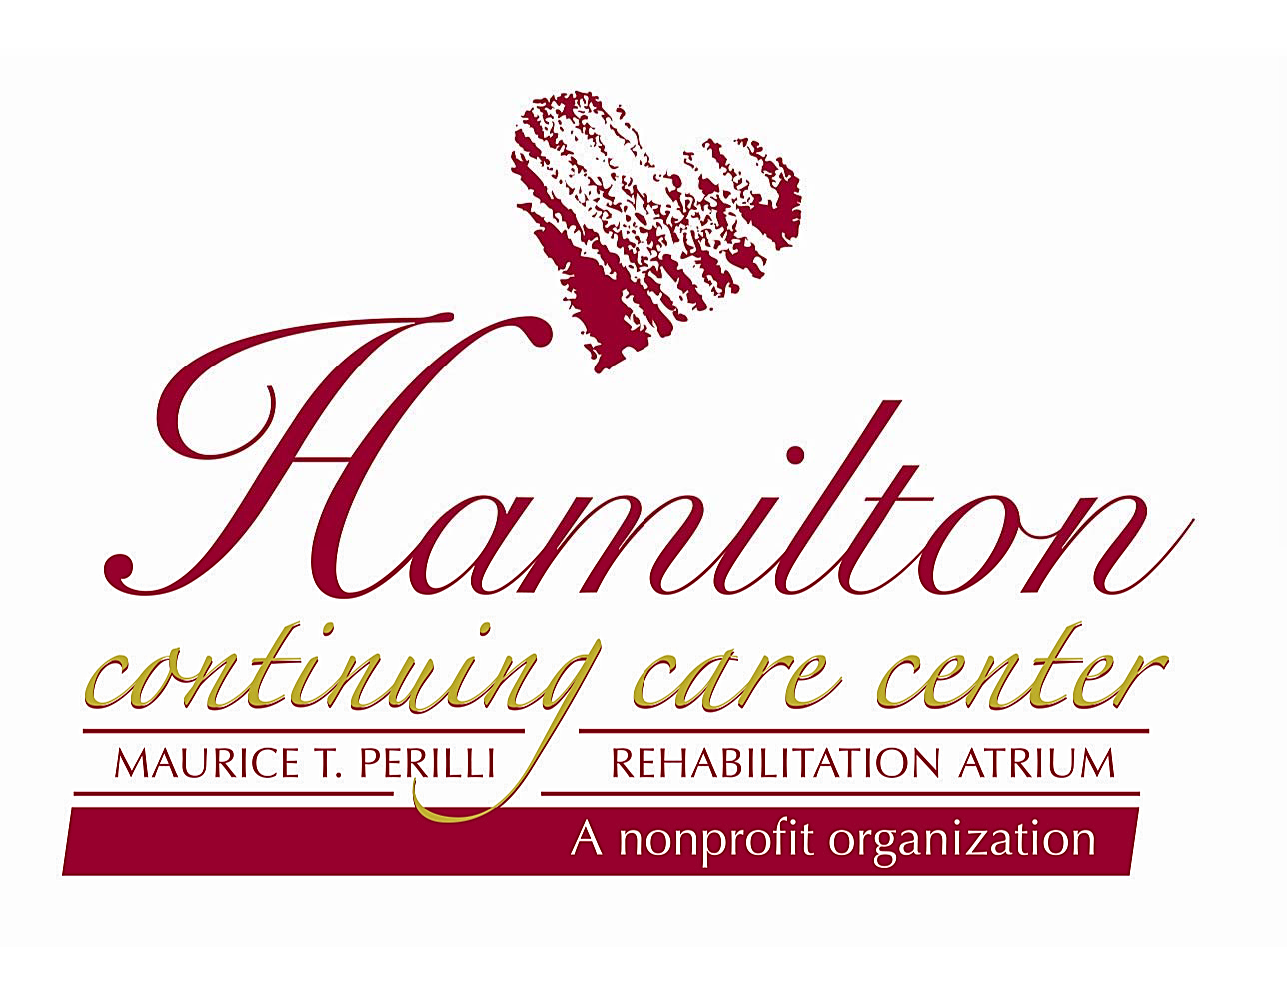 Hamilton Continuing Care Center